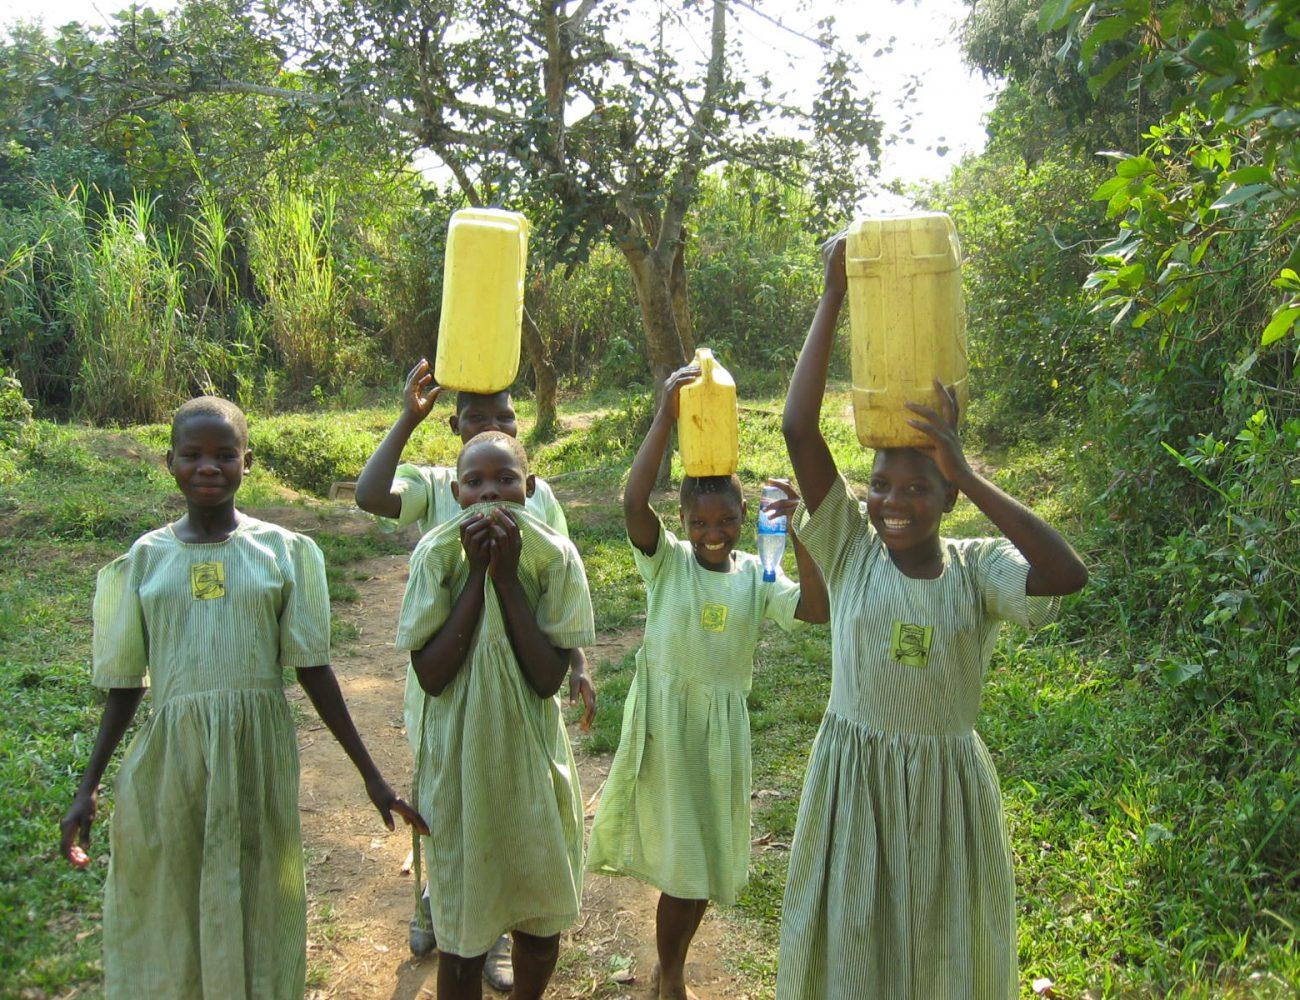 Schülerinnen beim Wasserholen